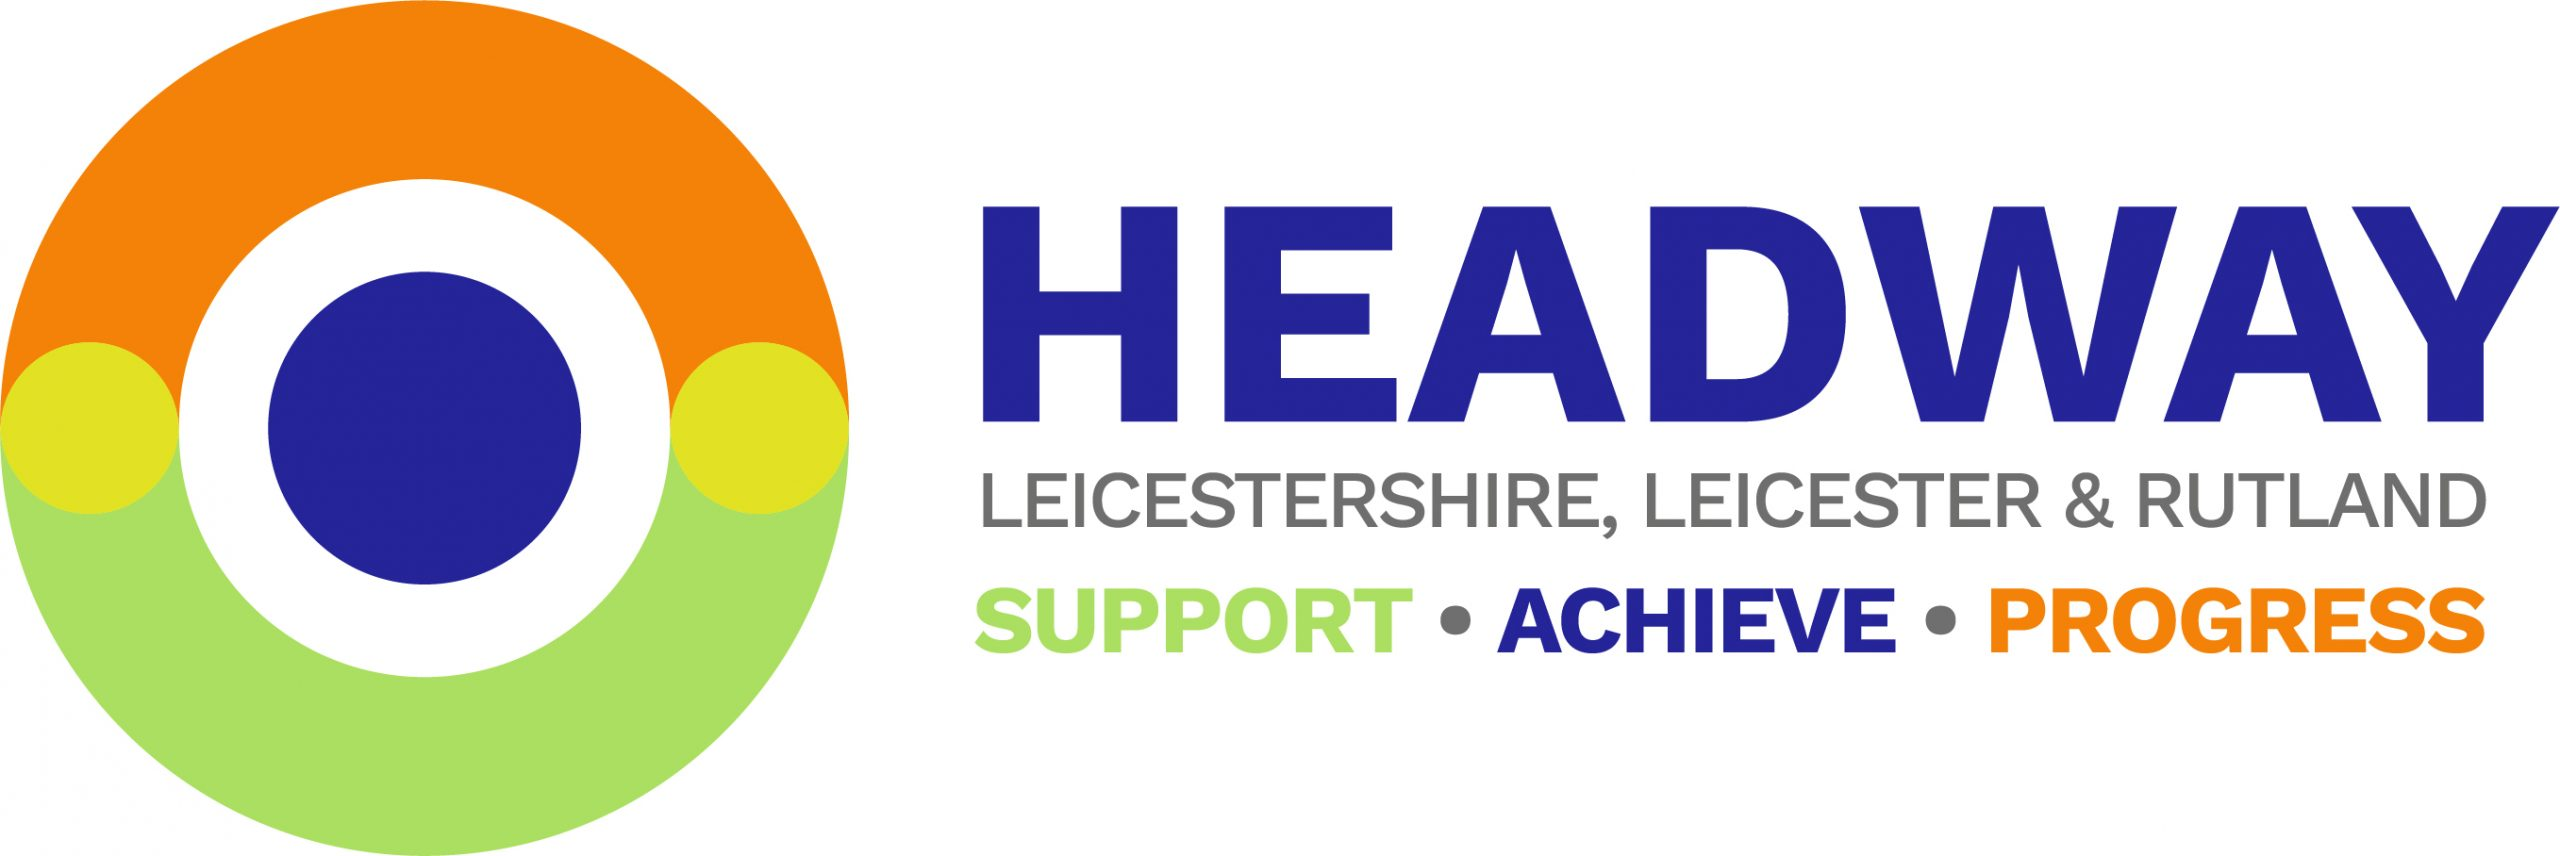 headway leicester logo